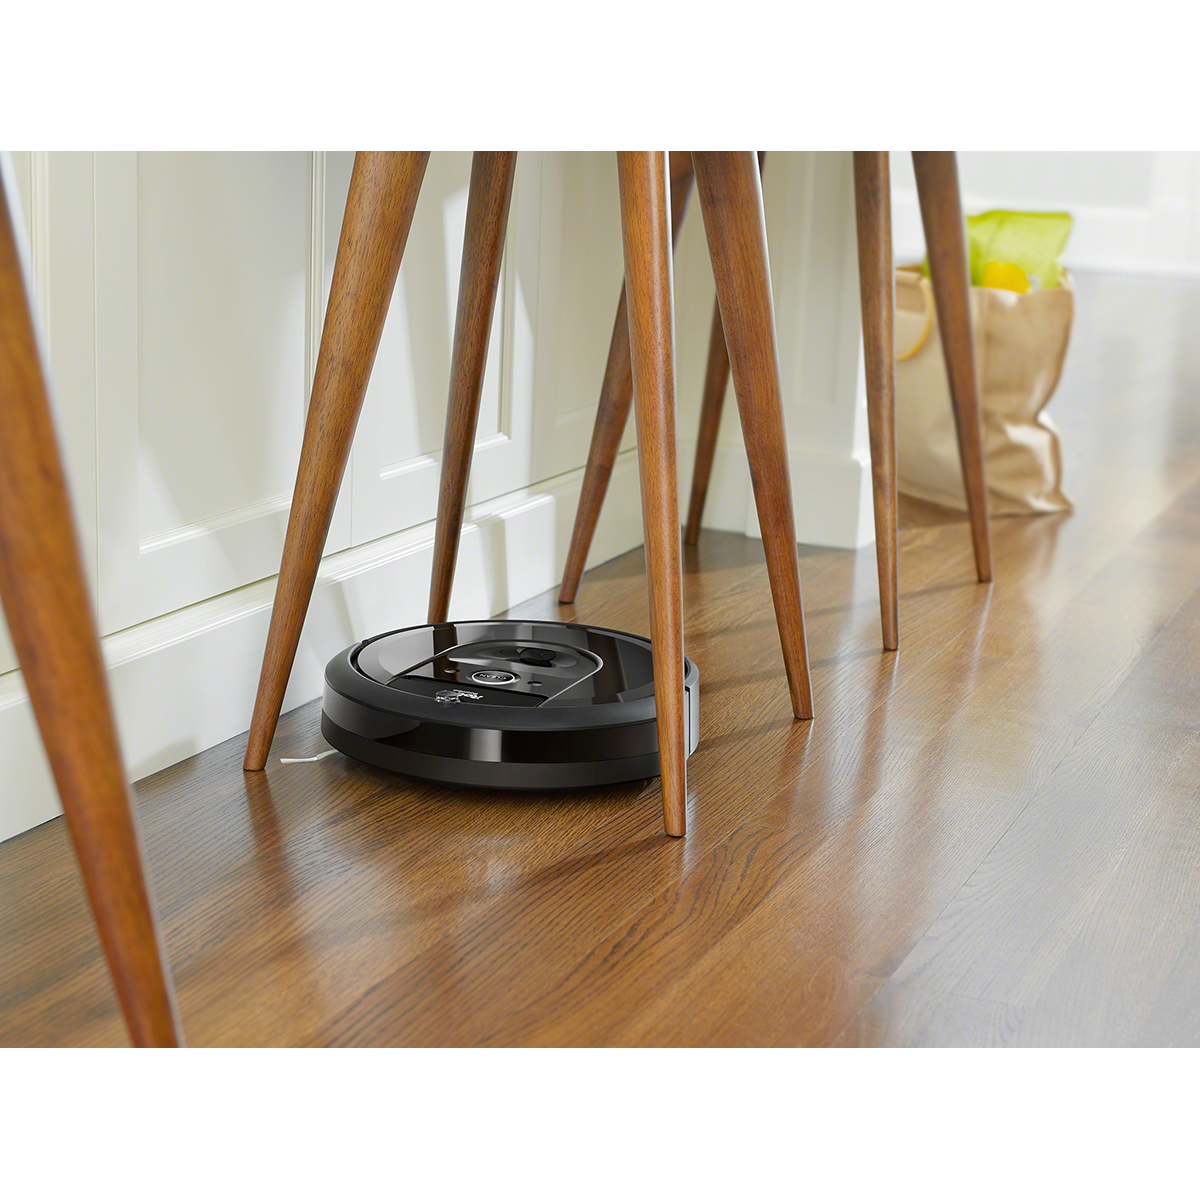 i7_i7-_Charcoal_Photo_InSitu_Under_Furniture